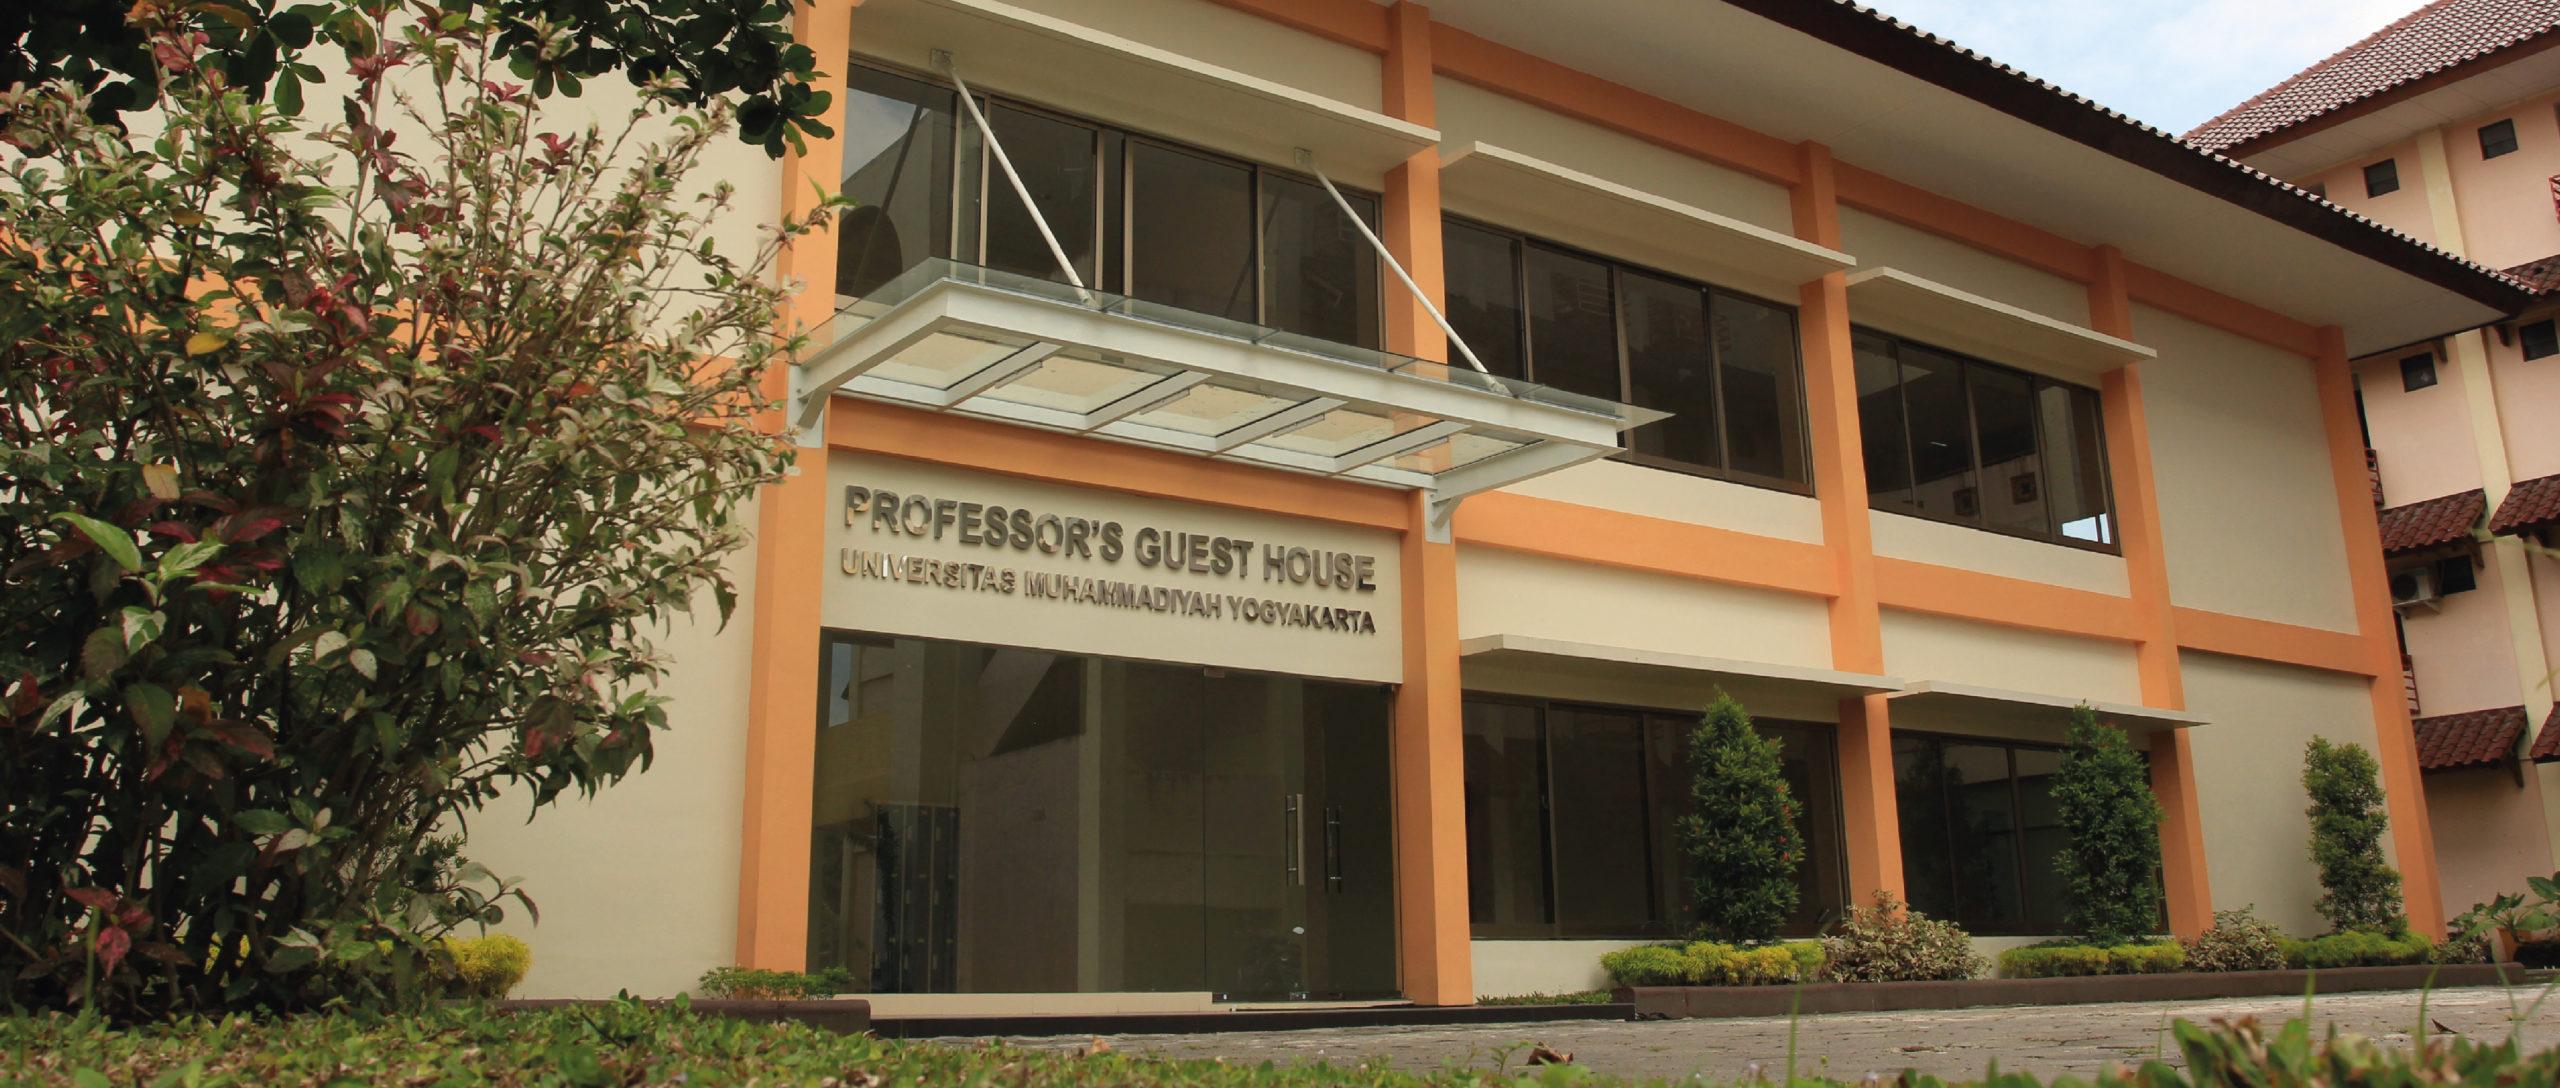 Professor's Guest House